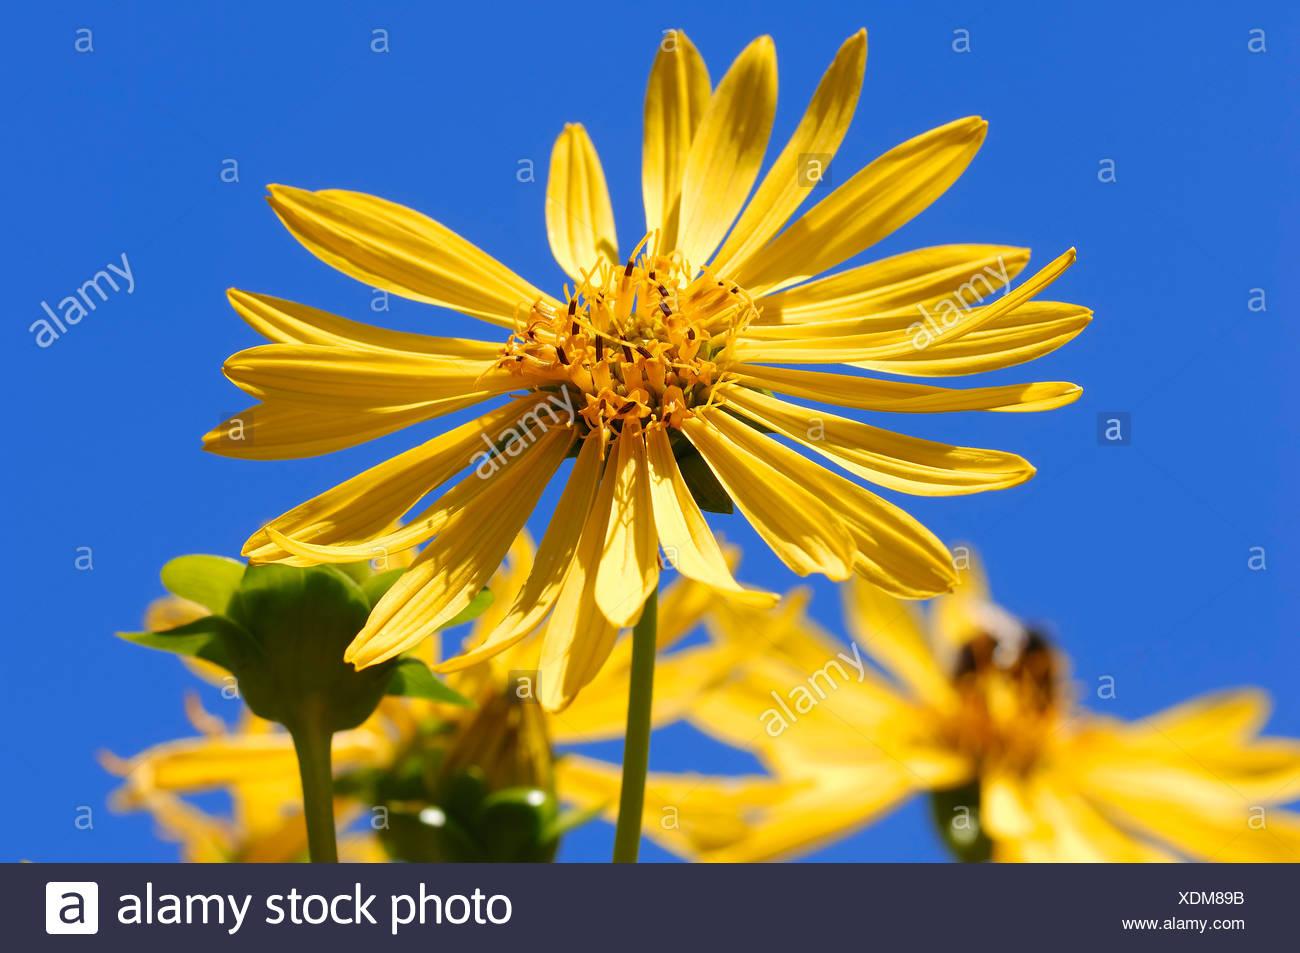 Jerusalem Artichoke, sunroot, sunchoke, earth apple or topinambour (Helianthus tuberosus), flower, occurrence in North America - Stock Image